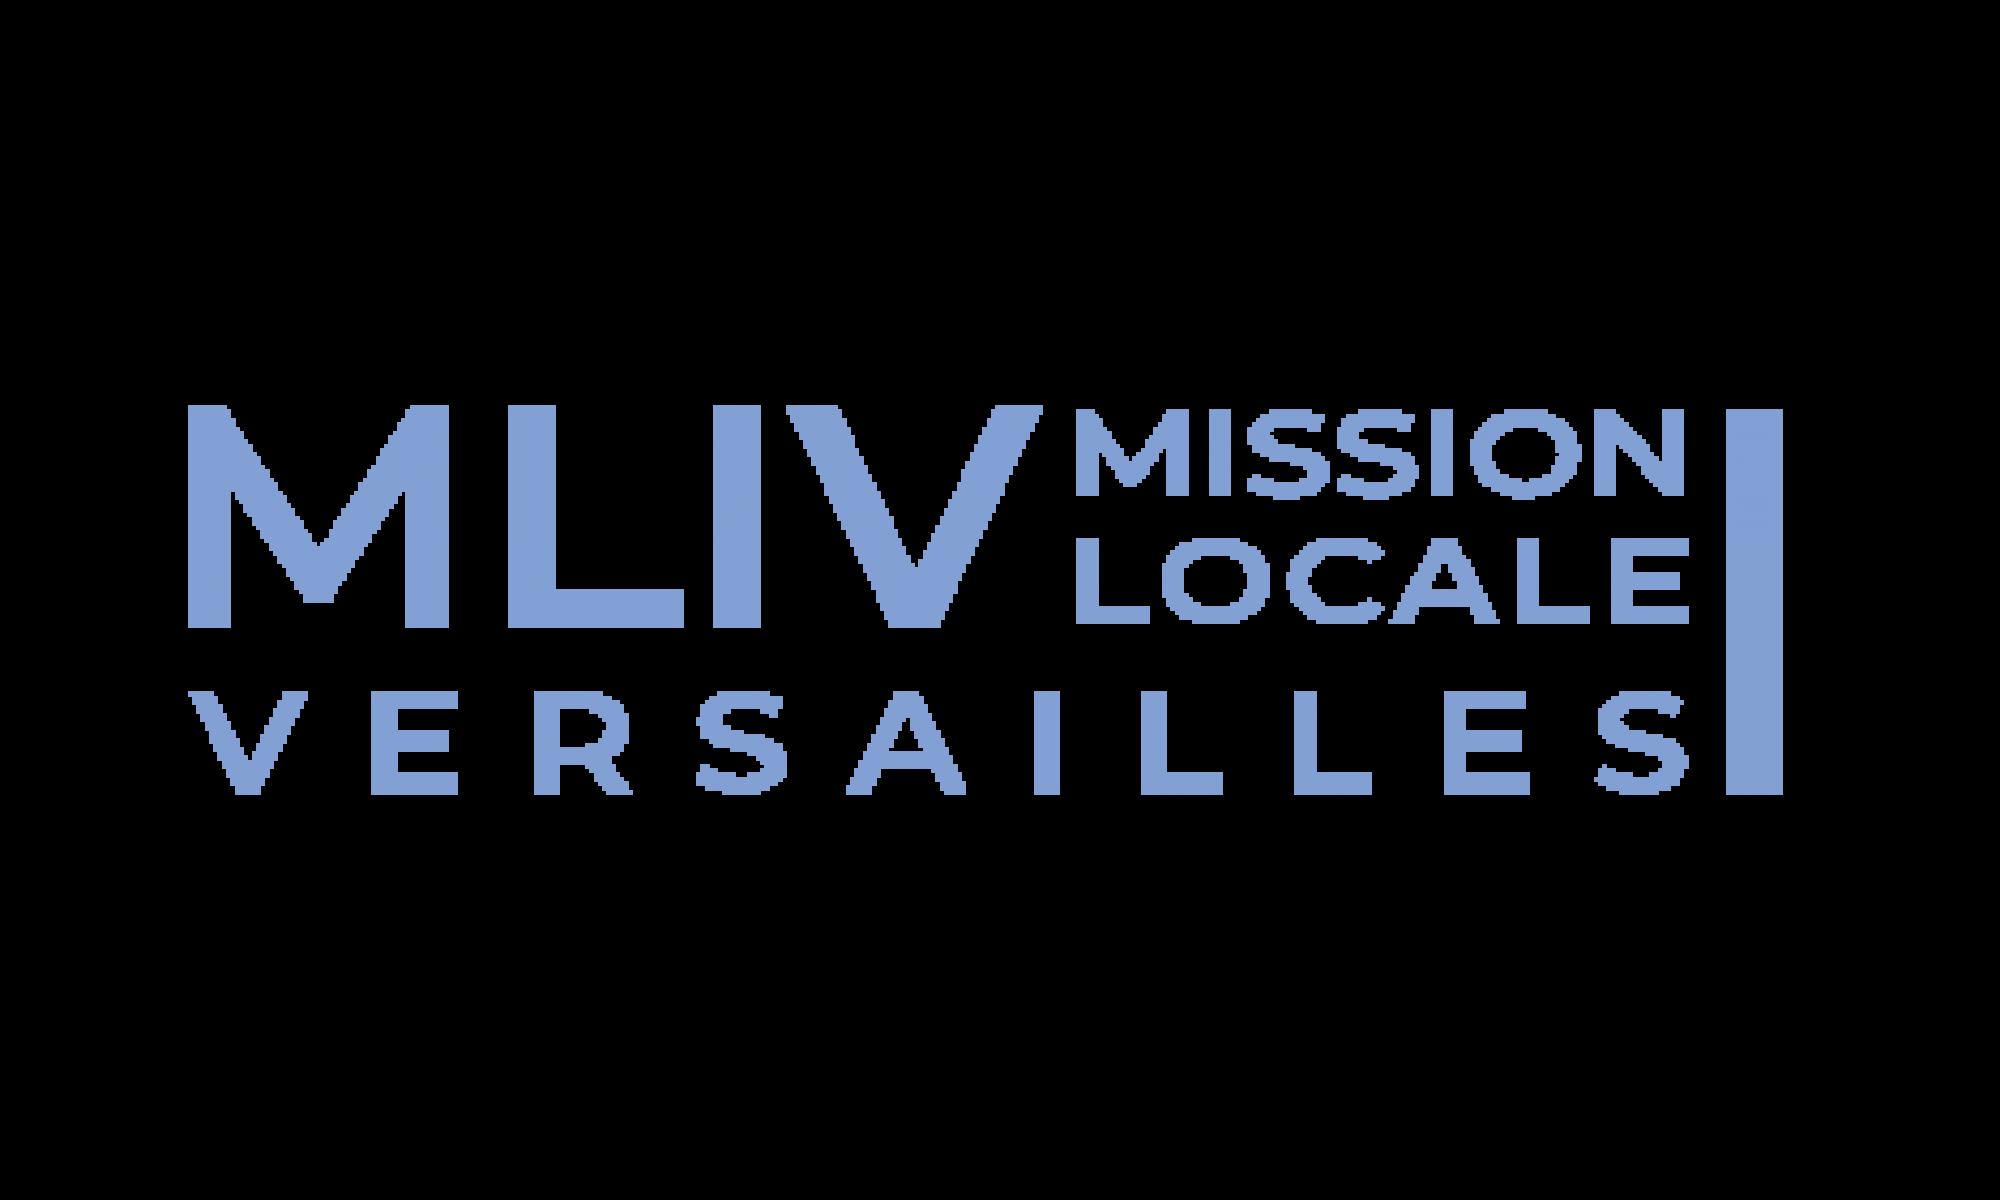 Mission Locale Intercommunale de Versailles